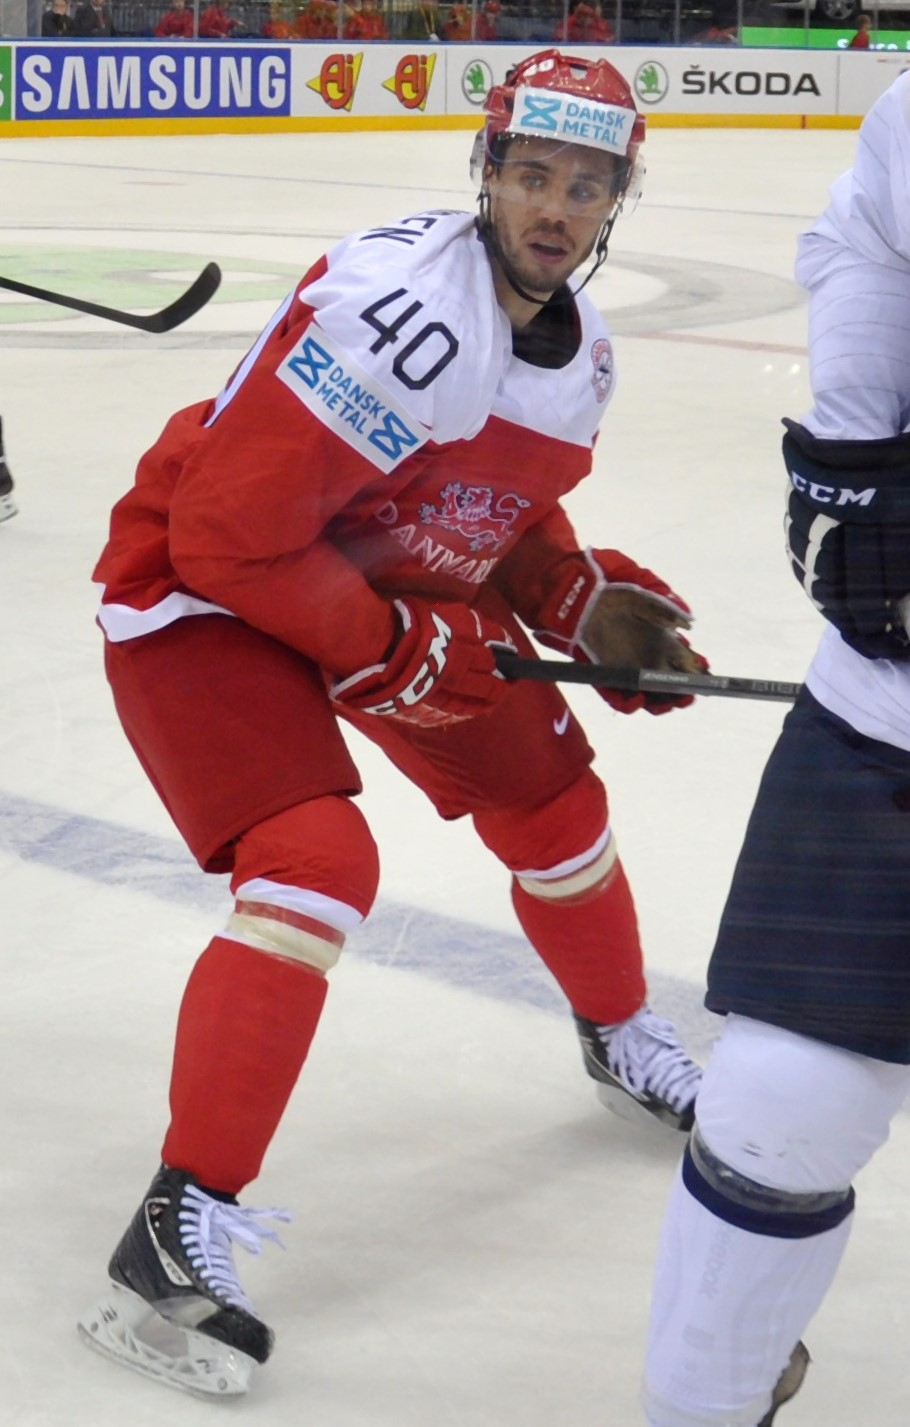 Jesper Jensen jesper jensen profile - Йеспер Йенсен Профиль - eurohockey